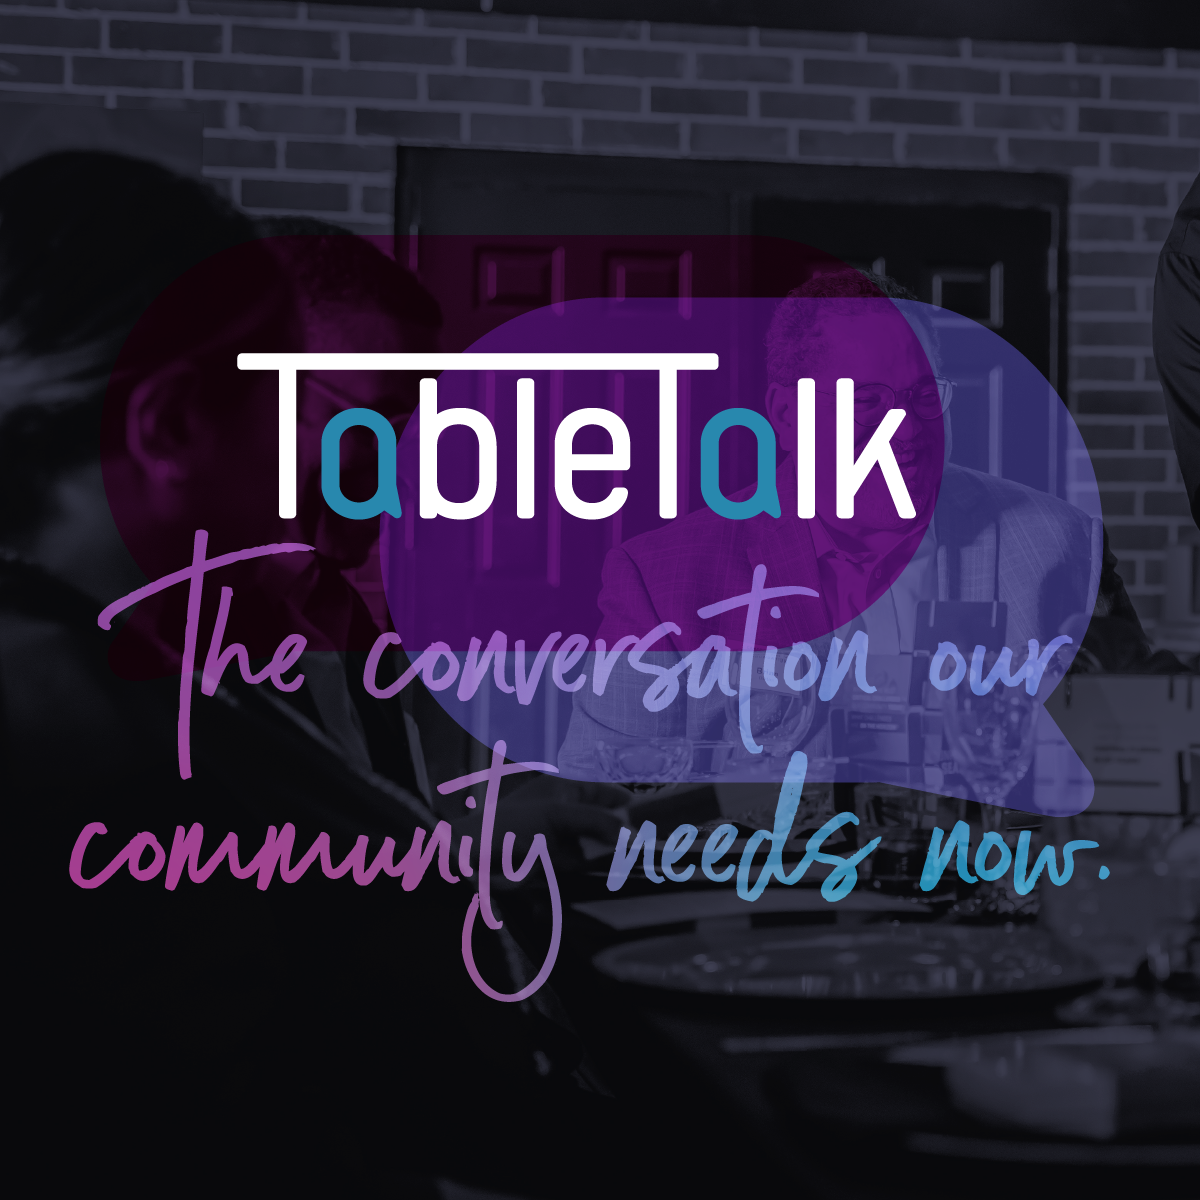 cff-2014-tabletalk-socialimage